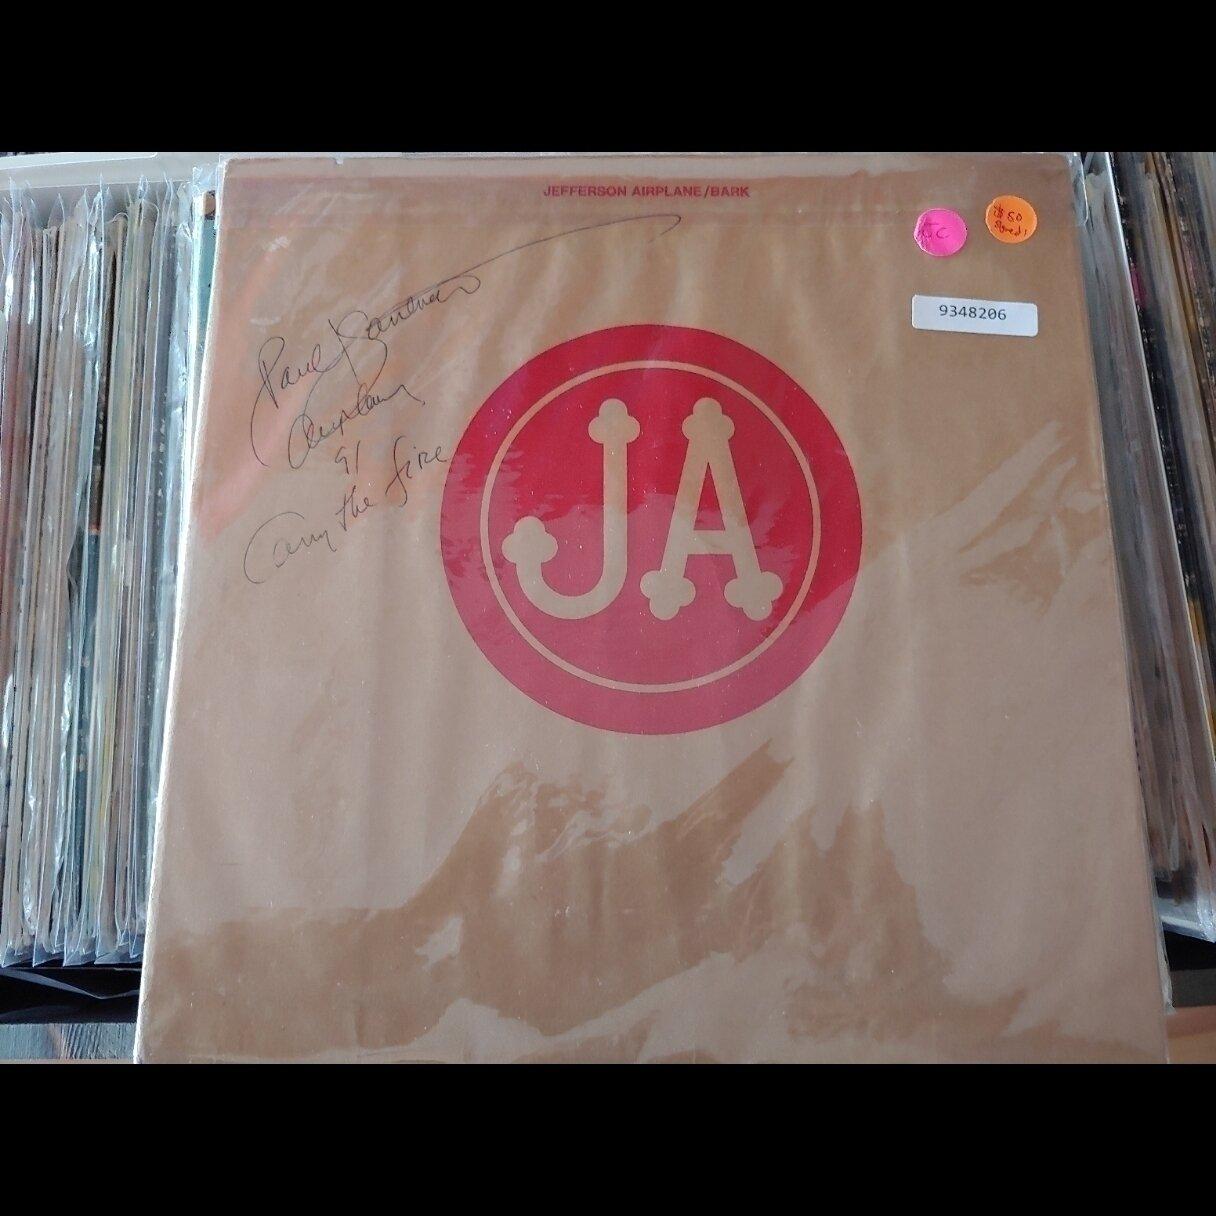 Jefferson Airplane - Bark (Autograph)